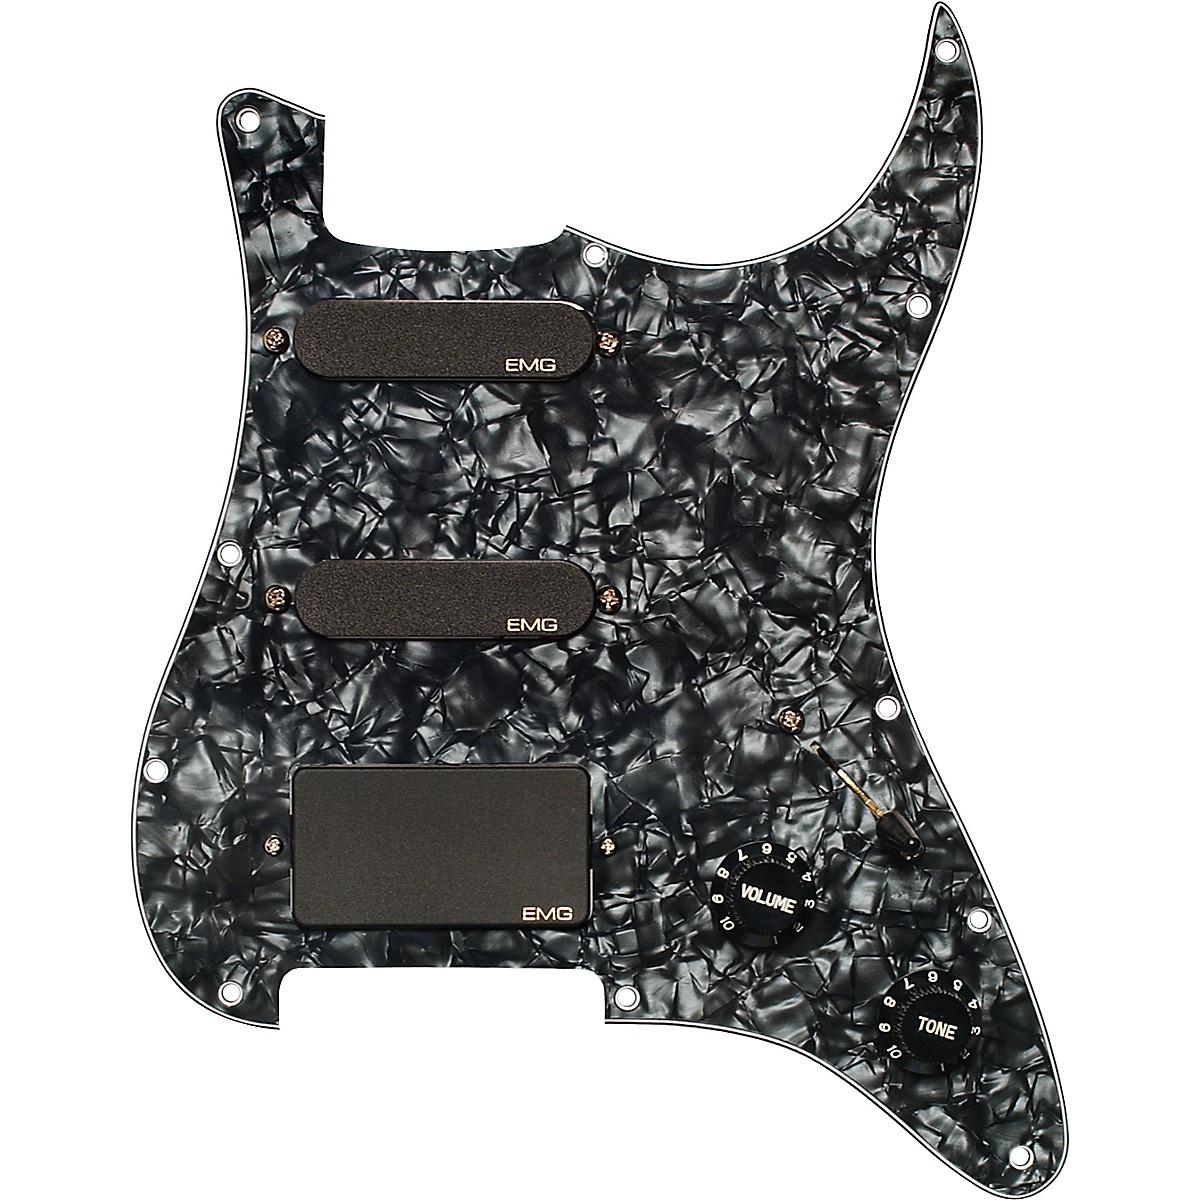 EMG EMG-SL20 Steve Lukather Prewired Pickguard/Pickup Set